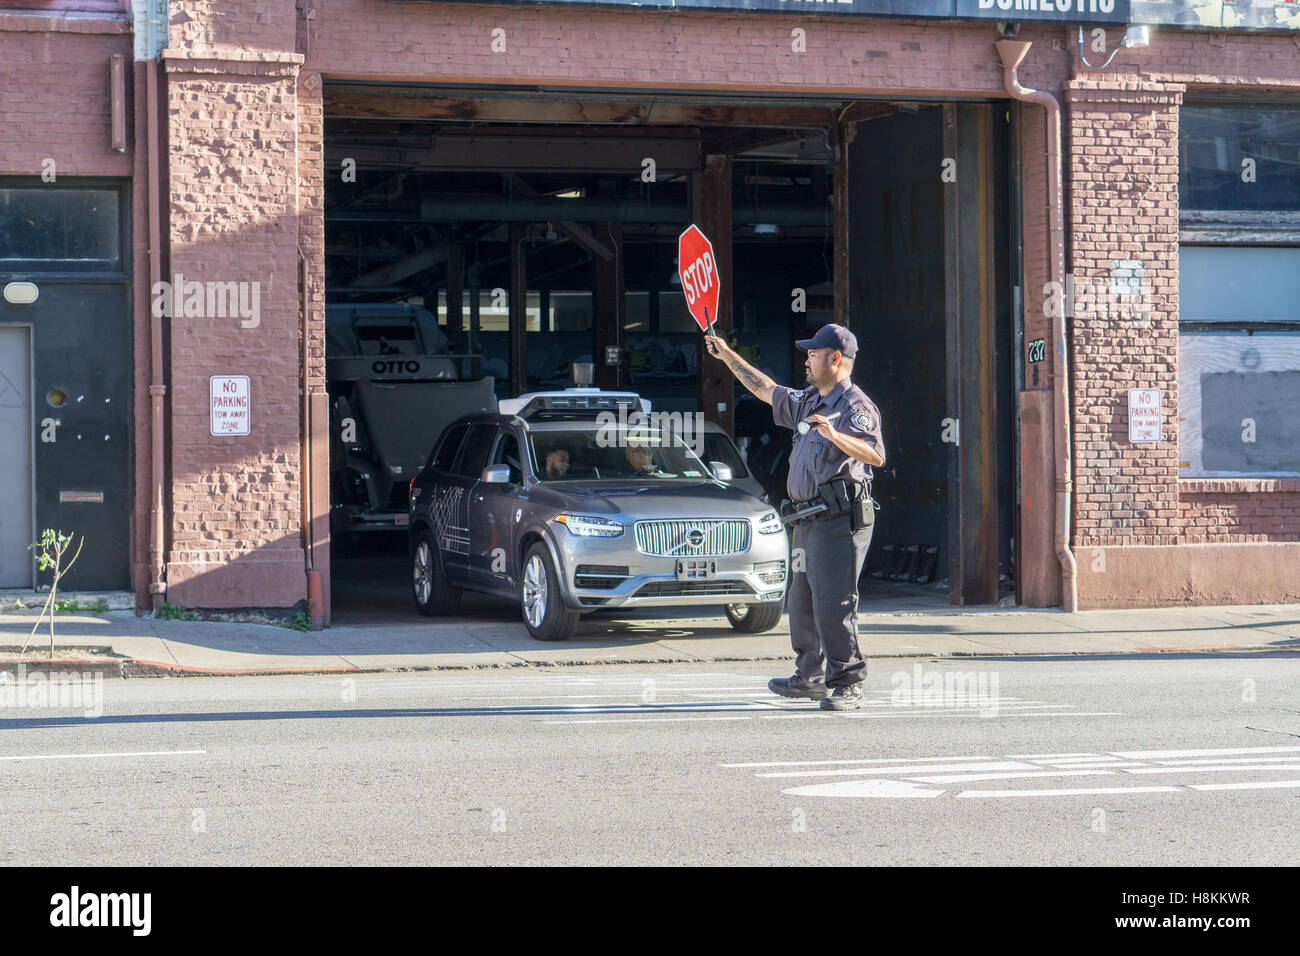 uber-self-driving-vehicle-testing-in-san